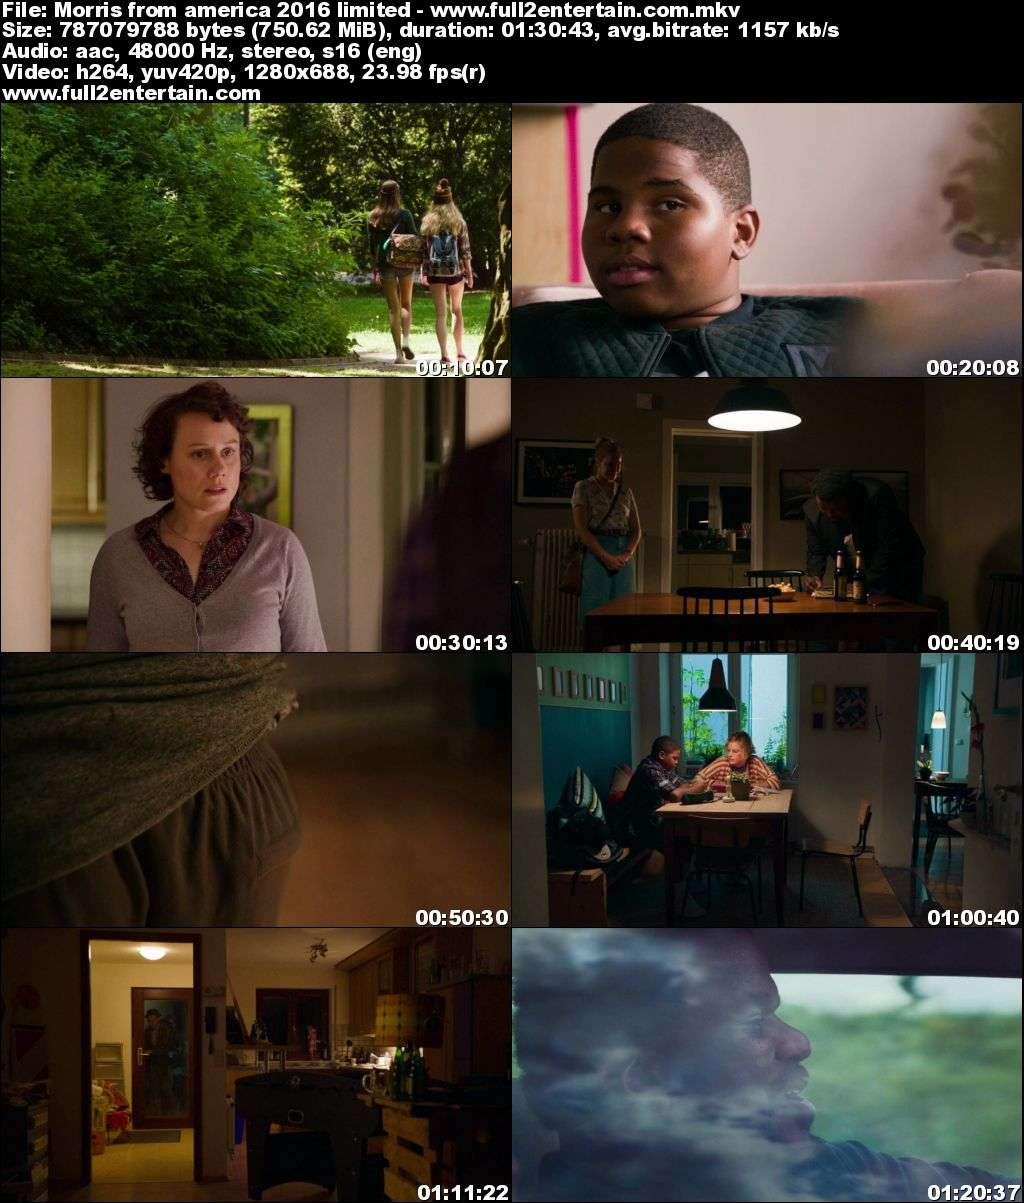 Morris from America 2016 Full Dvdrip Movie Download Avi